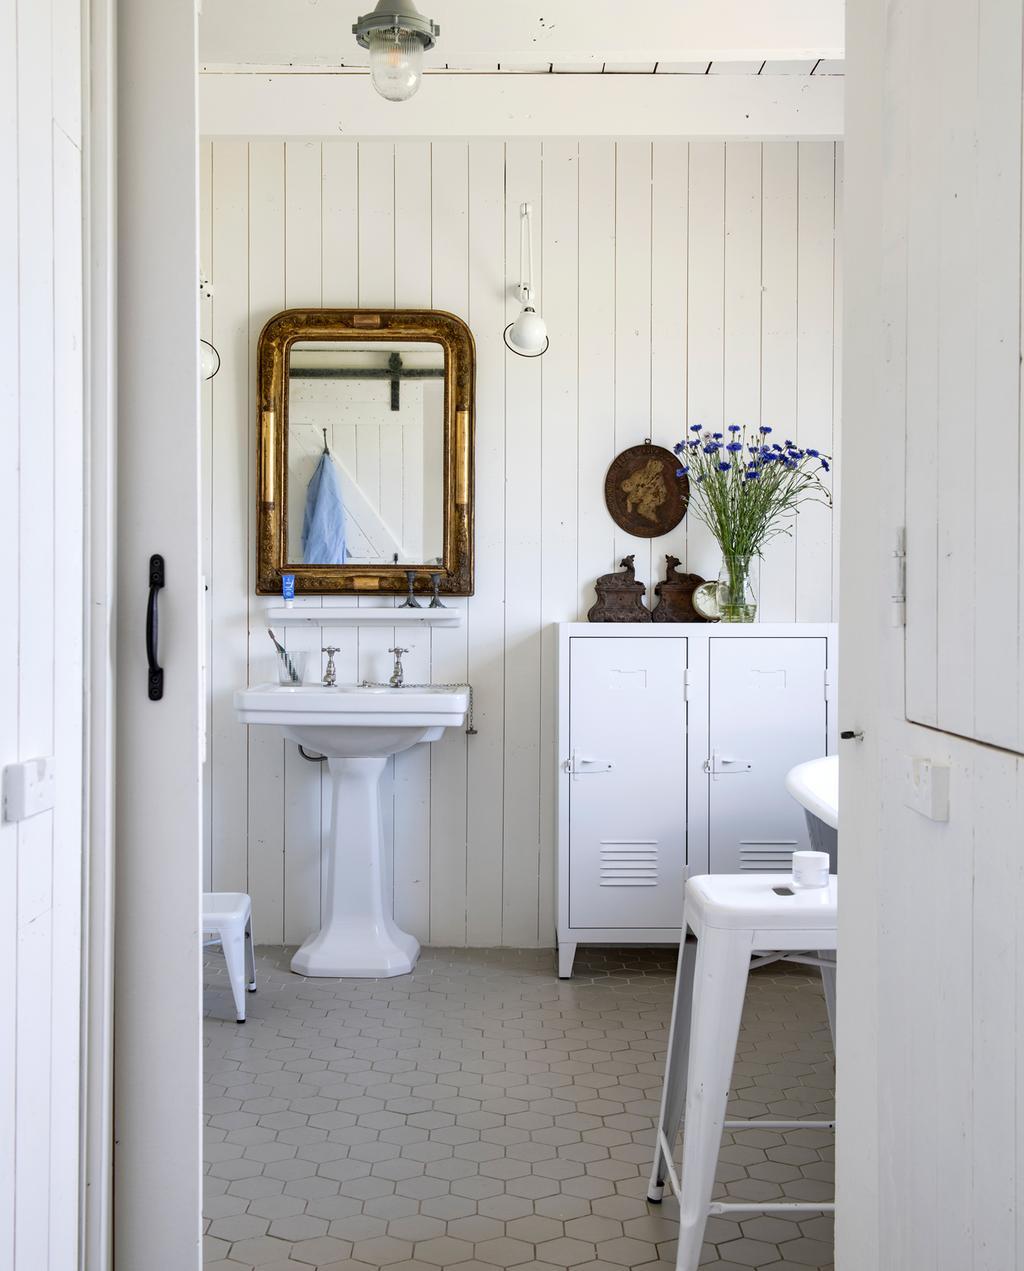 vtwonen binnenkijken special 2019 | badkamer oude elementen